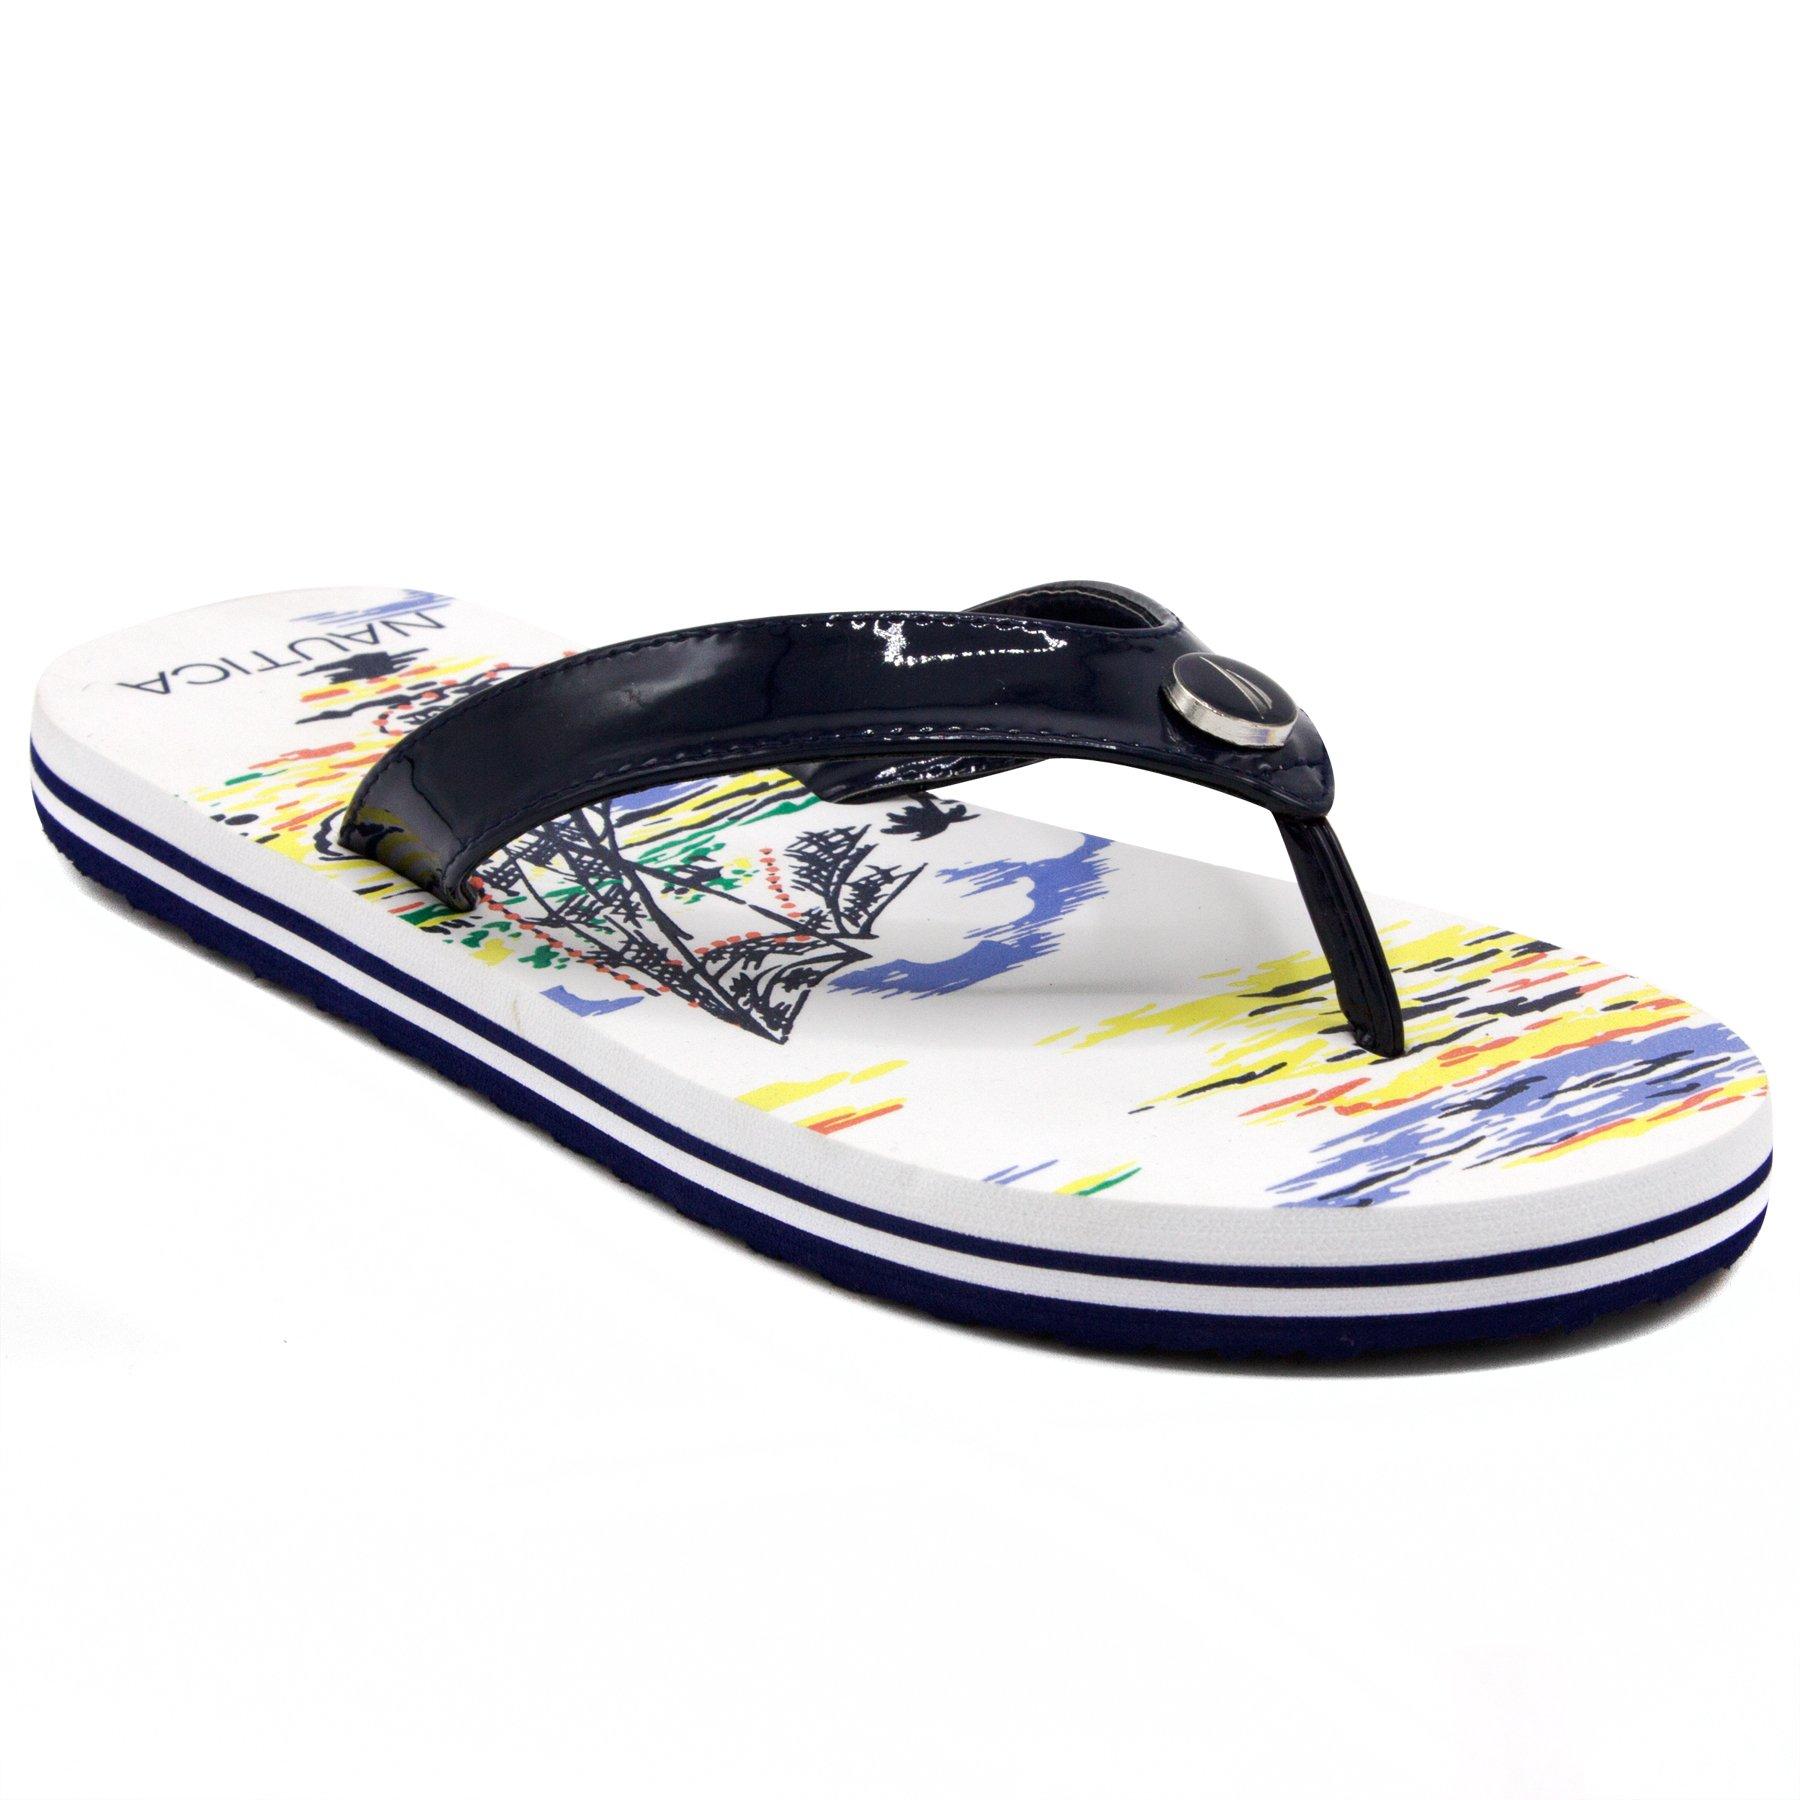 Nautica Women's Bernic Flip Flop, Beach Sandal Slide Hawaiian Style Tropical Print, Comfort Thong-Navy-8